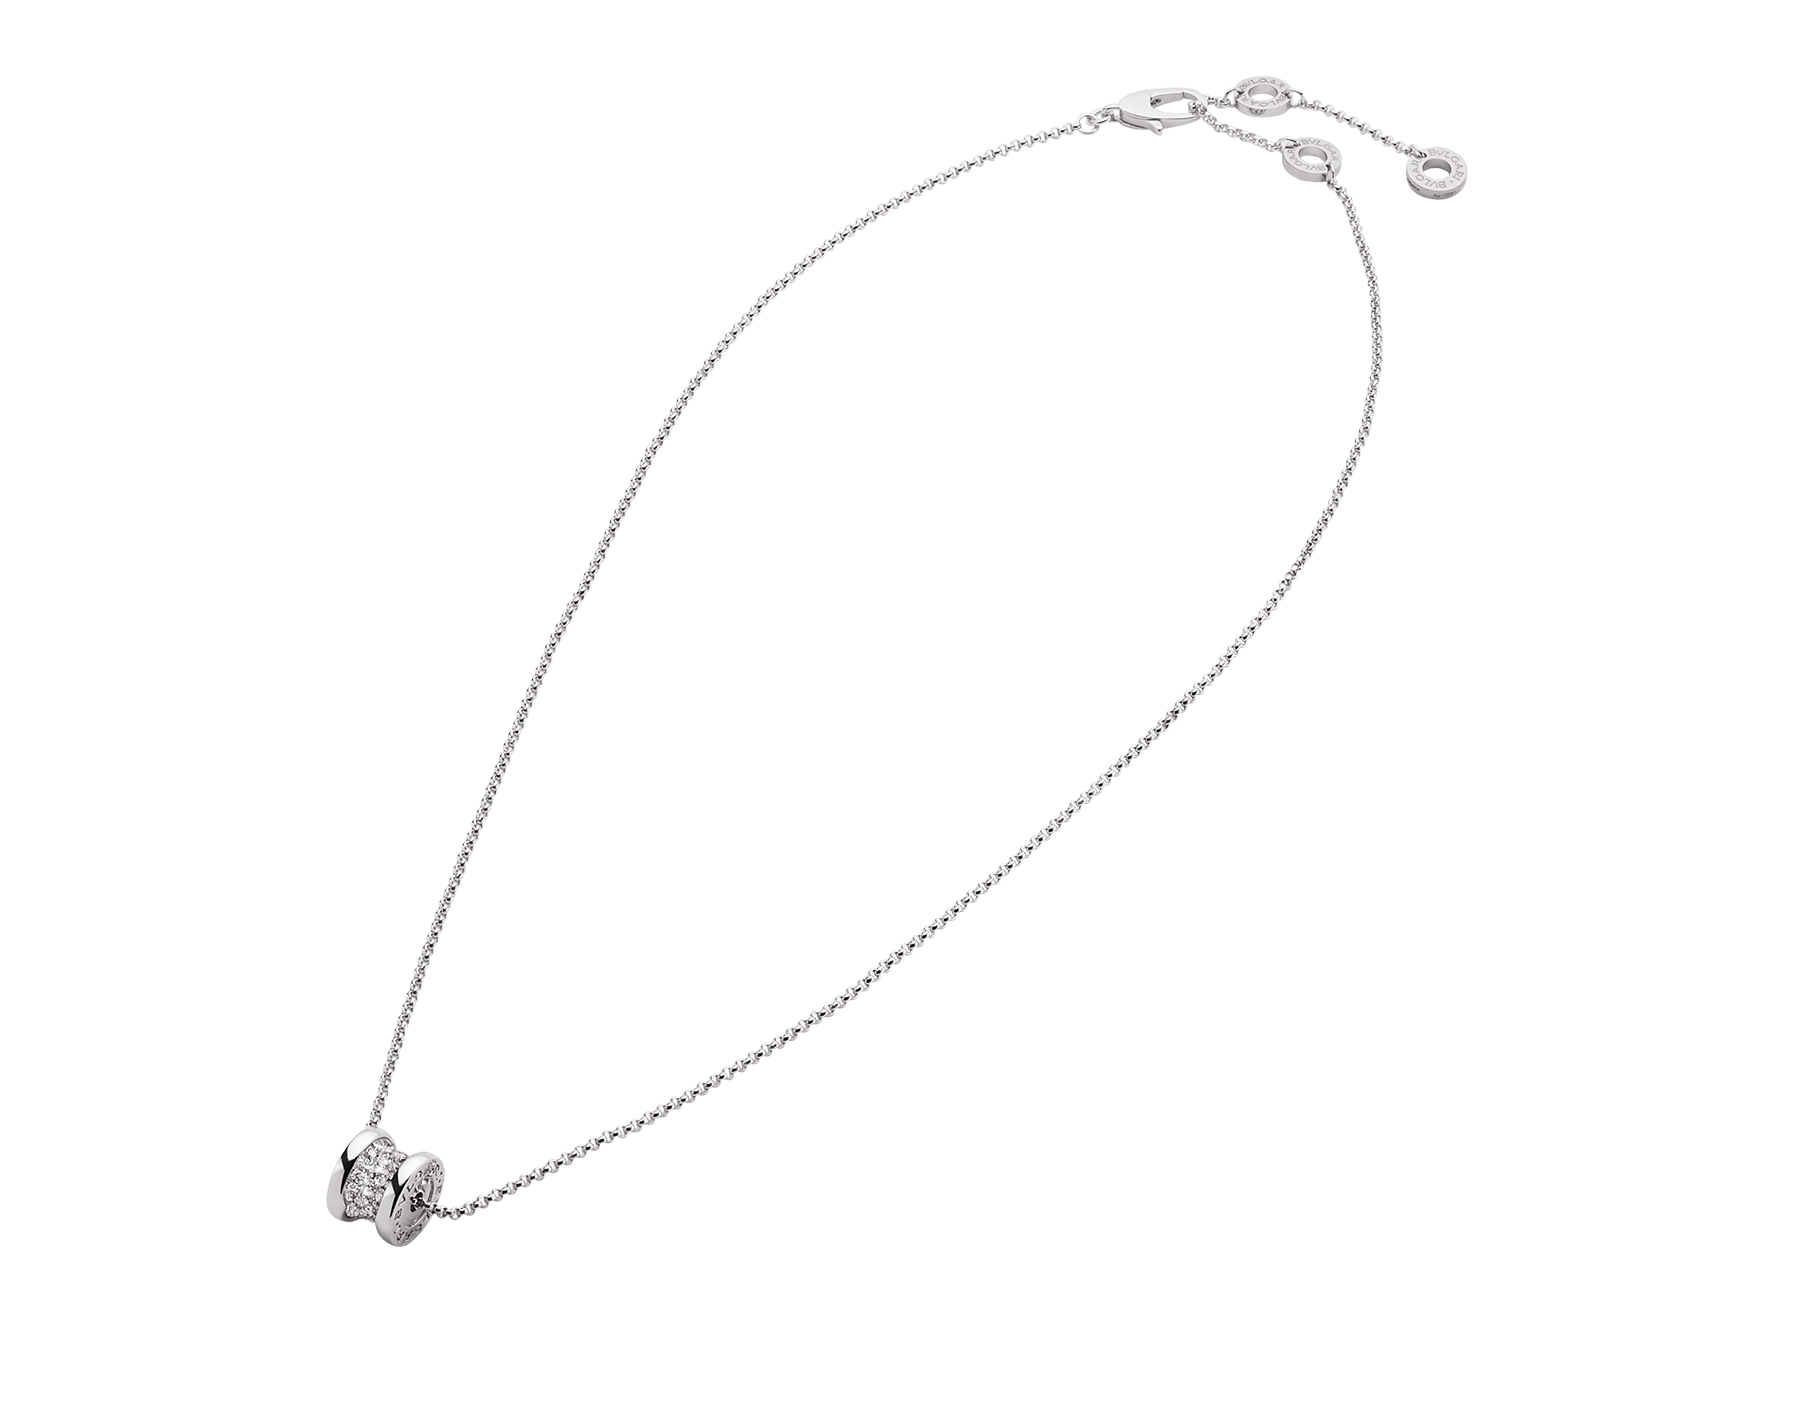 B.zero1 18K 白金項鍊,18K 白金圓形項墜,螺旋飾以密鑲鑽石。 351117 image 2